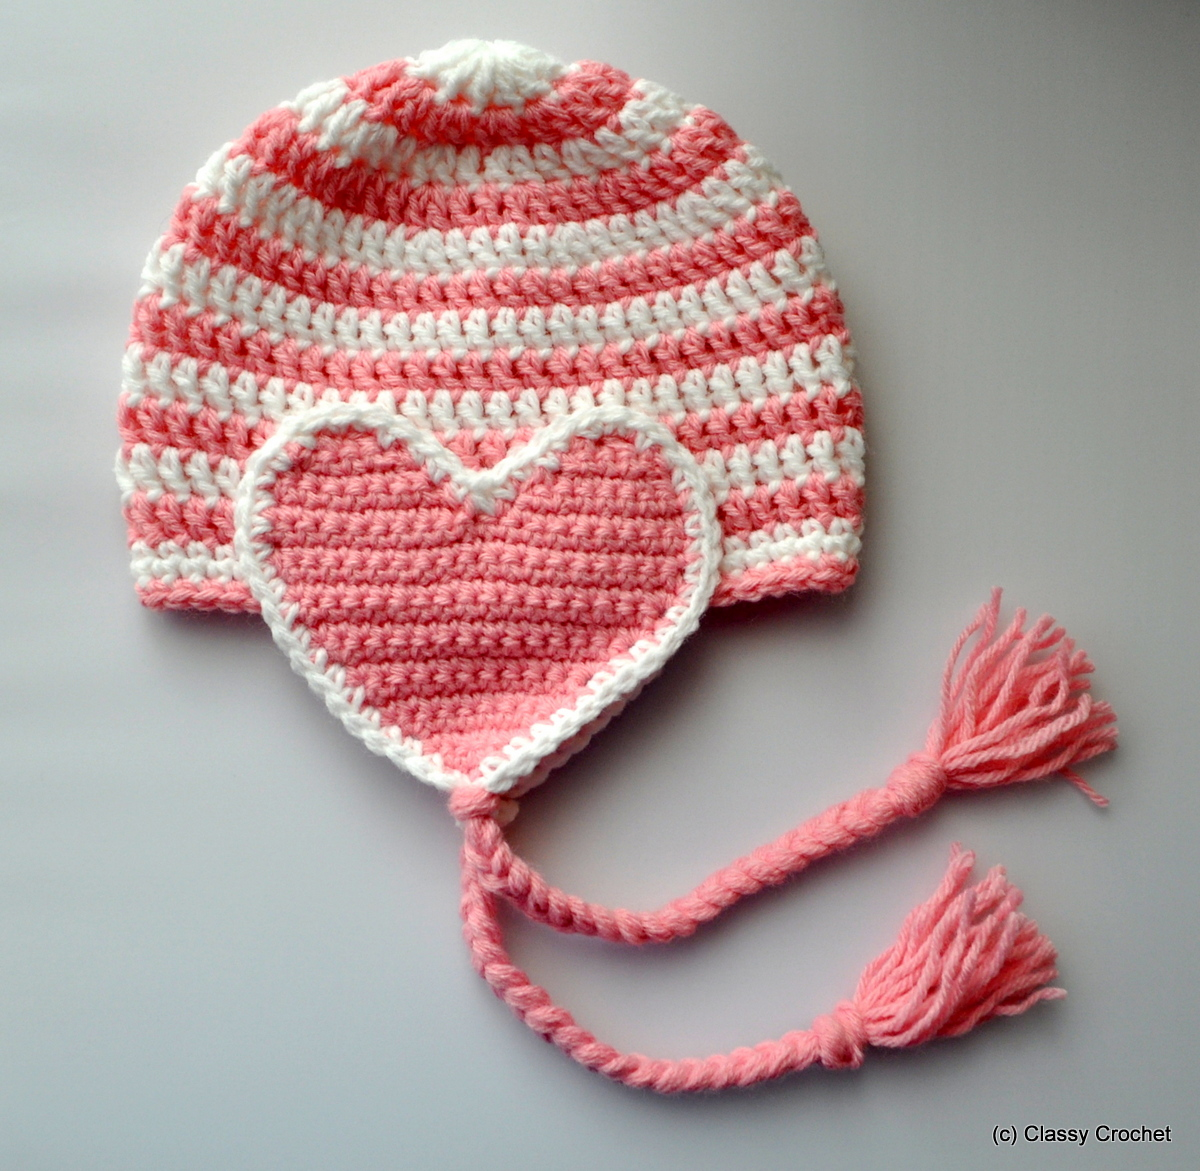 Crochet Patterns | Classy Crochet